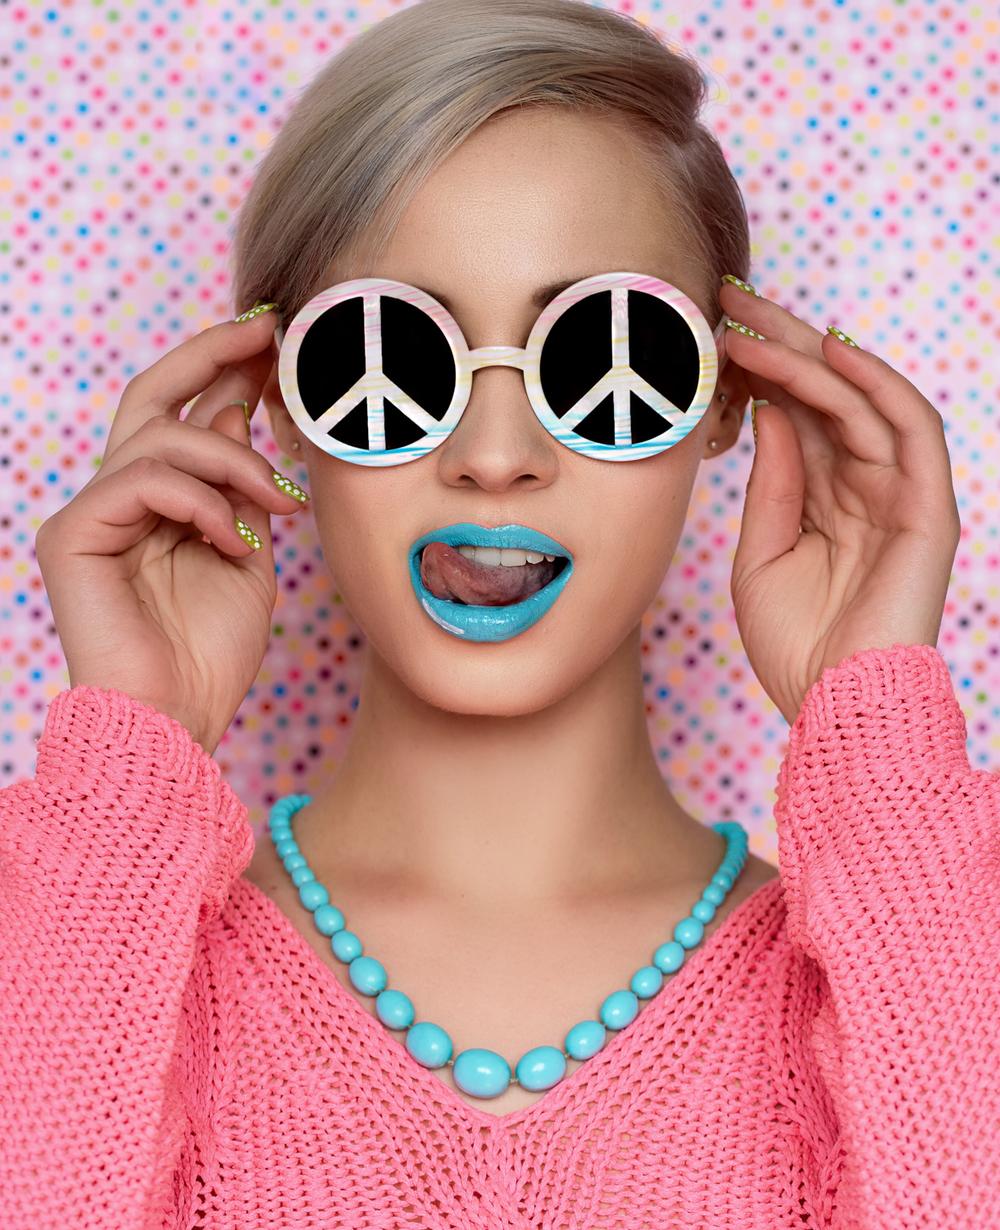 K14_0495-12-Kamal Mostofi-Beauty_ZyZi Makeup_Sally_80s.jpg